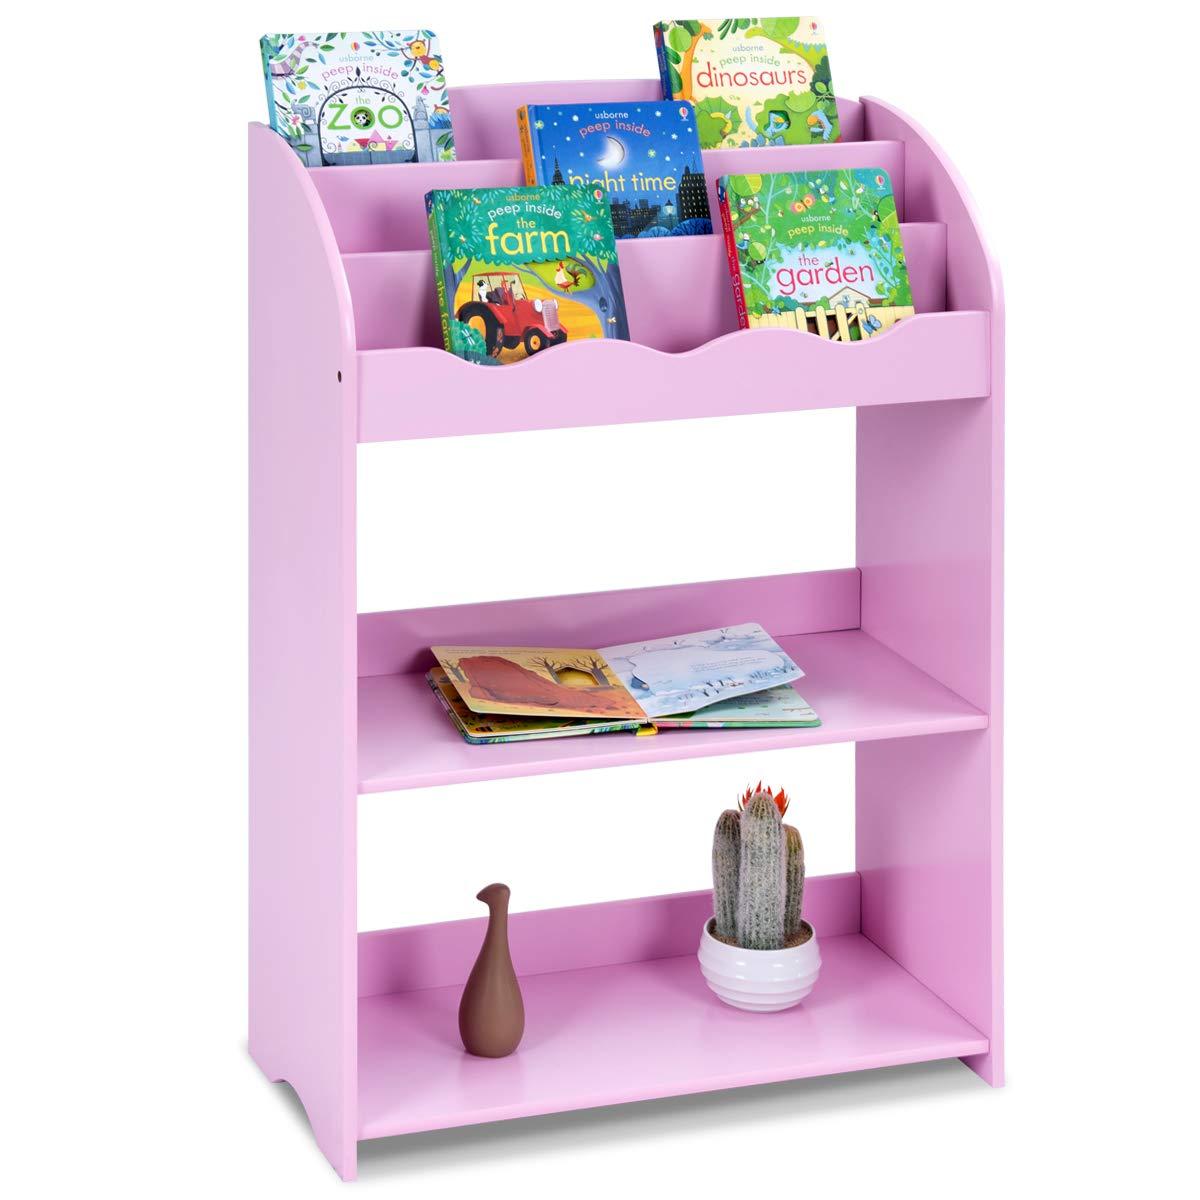 Costzon Wooden 3- Tiers Kids Bookshelf, 3 Tiers Bookcase & 2 Tiers Toy Organizer Magazine Storage Rack for Kids, Bedroom Playroom (Pink)